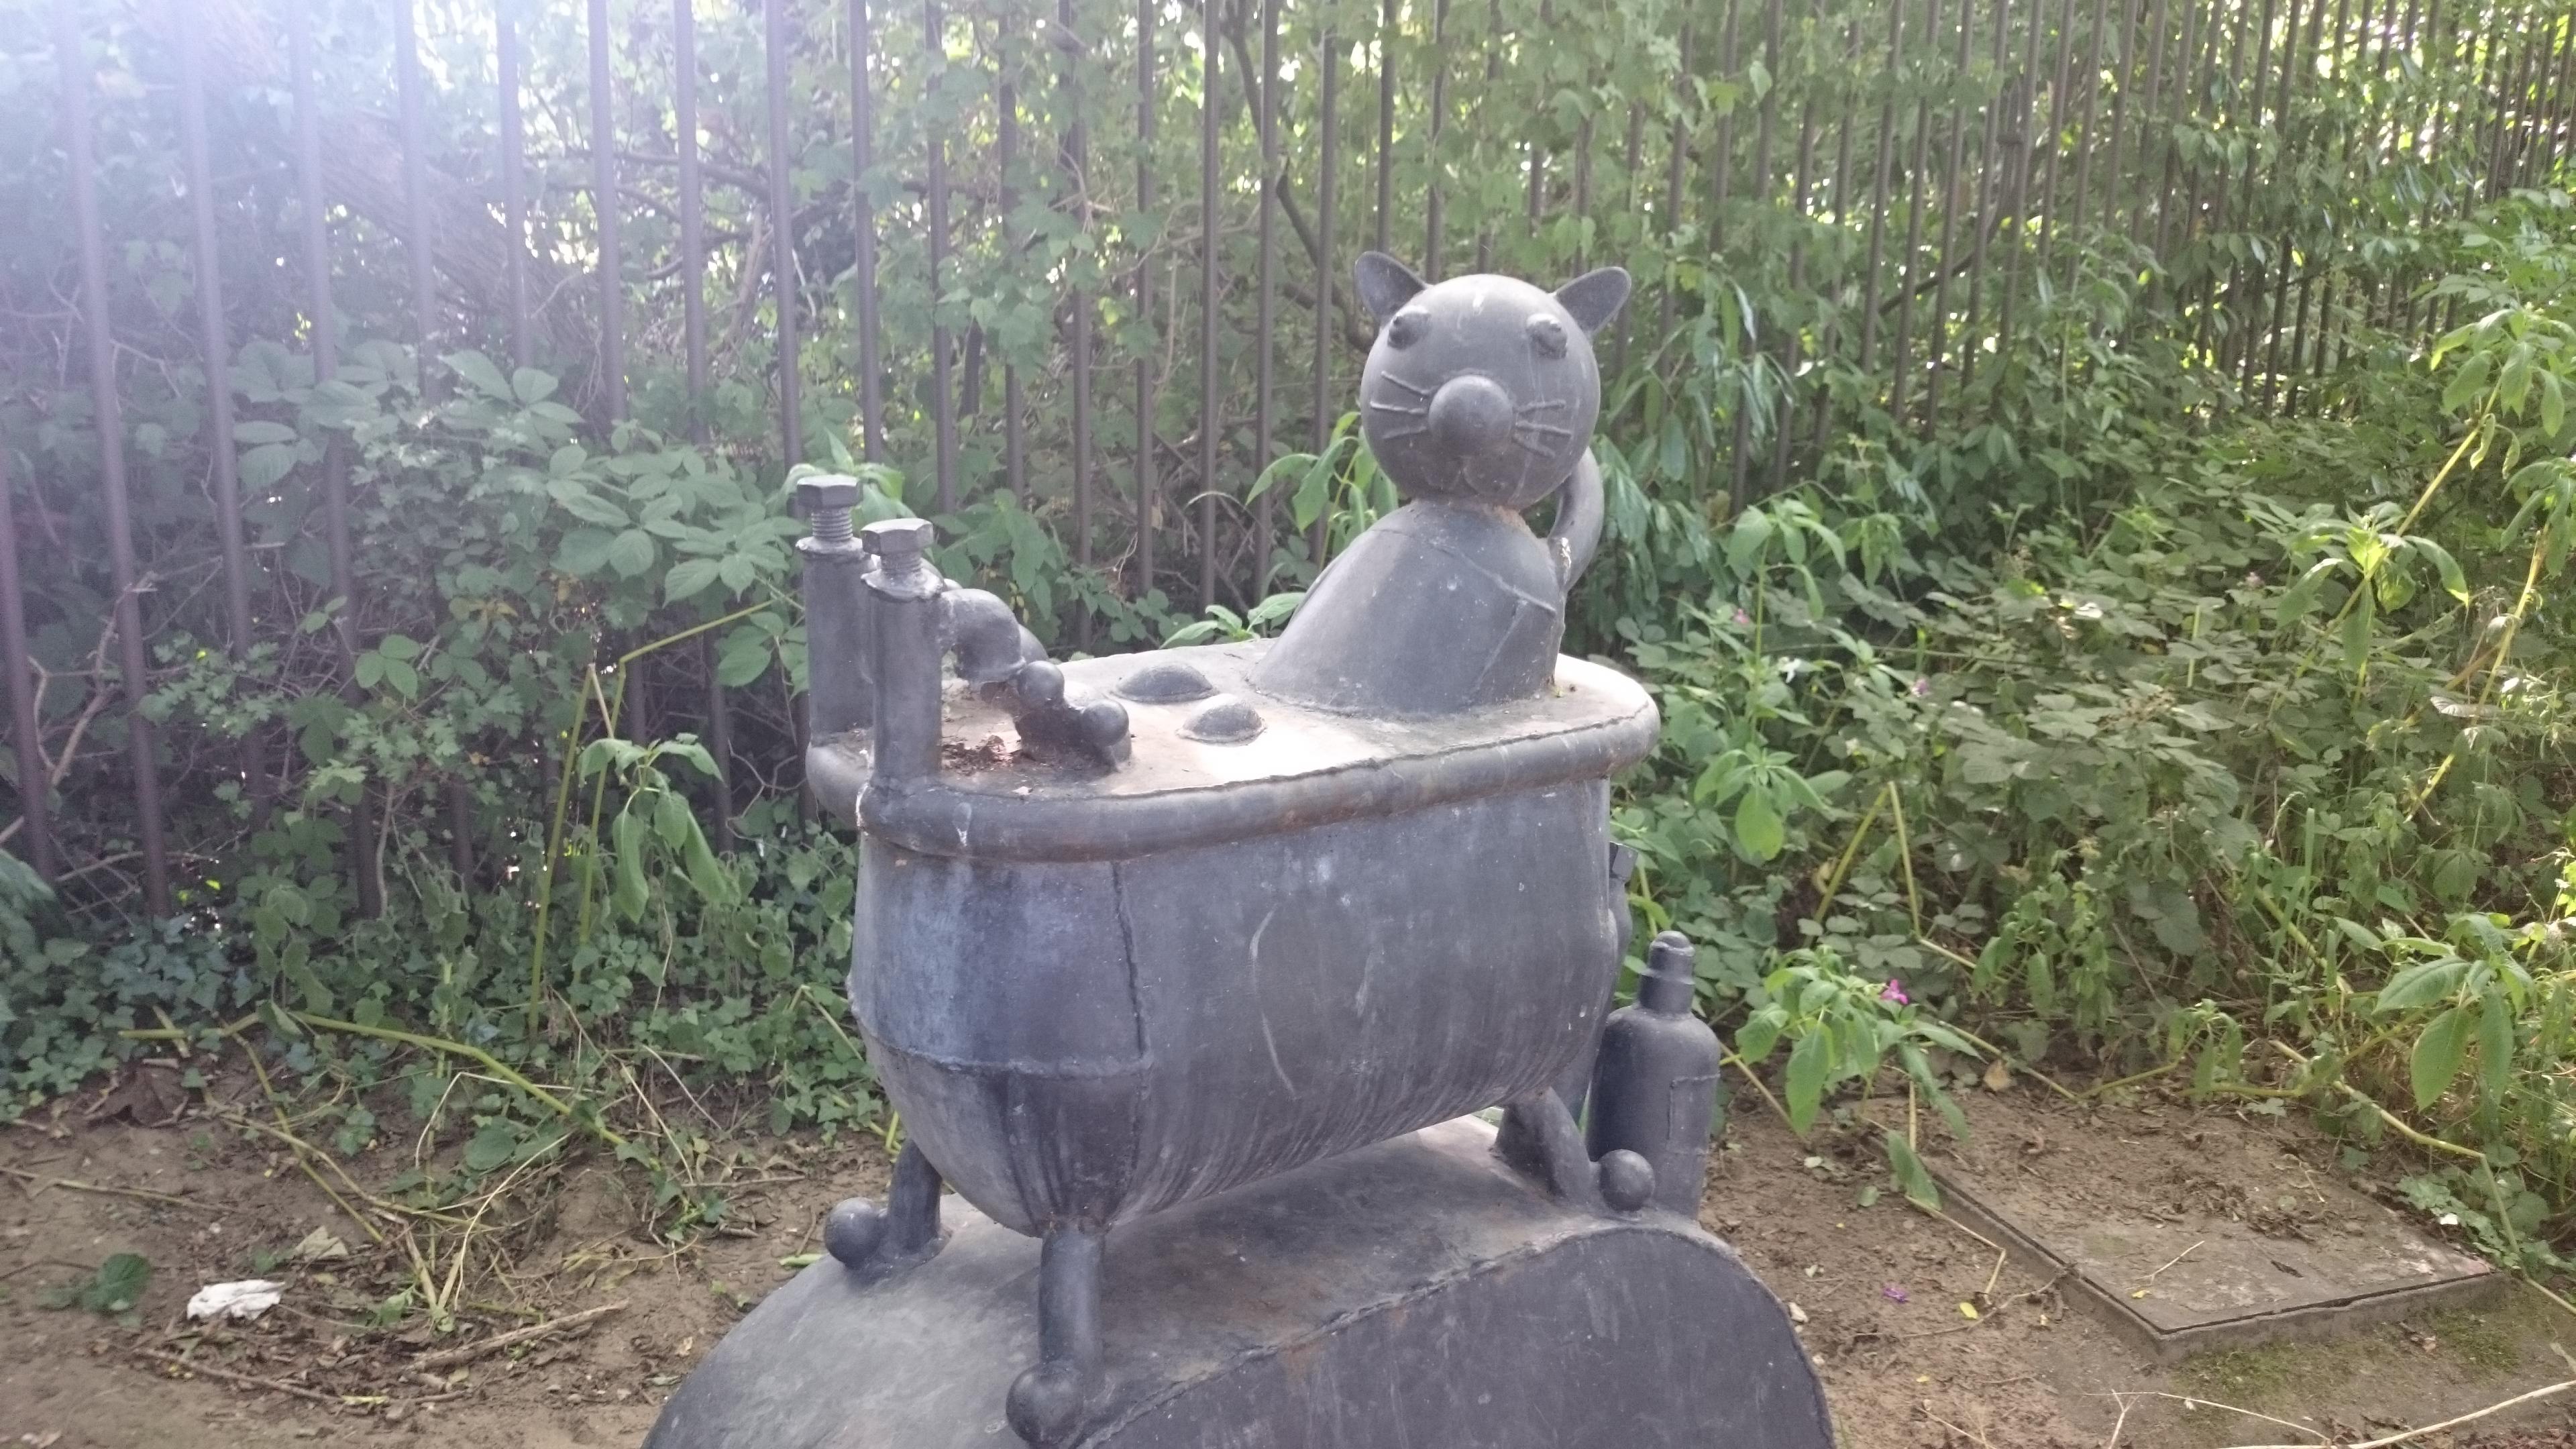 yorkshire sculpture trail, saltaire